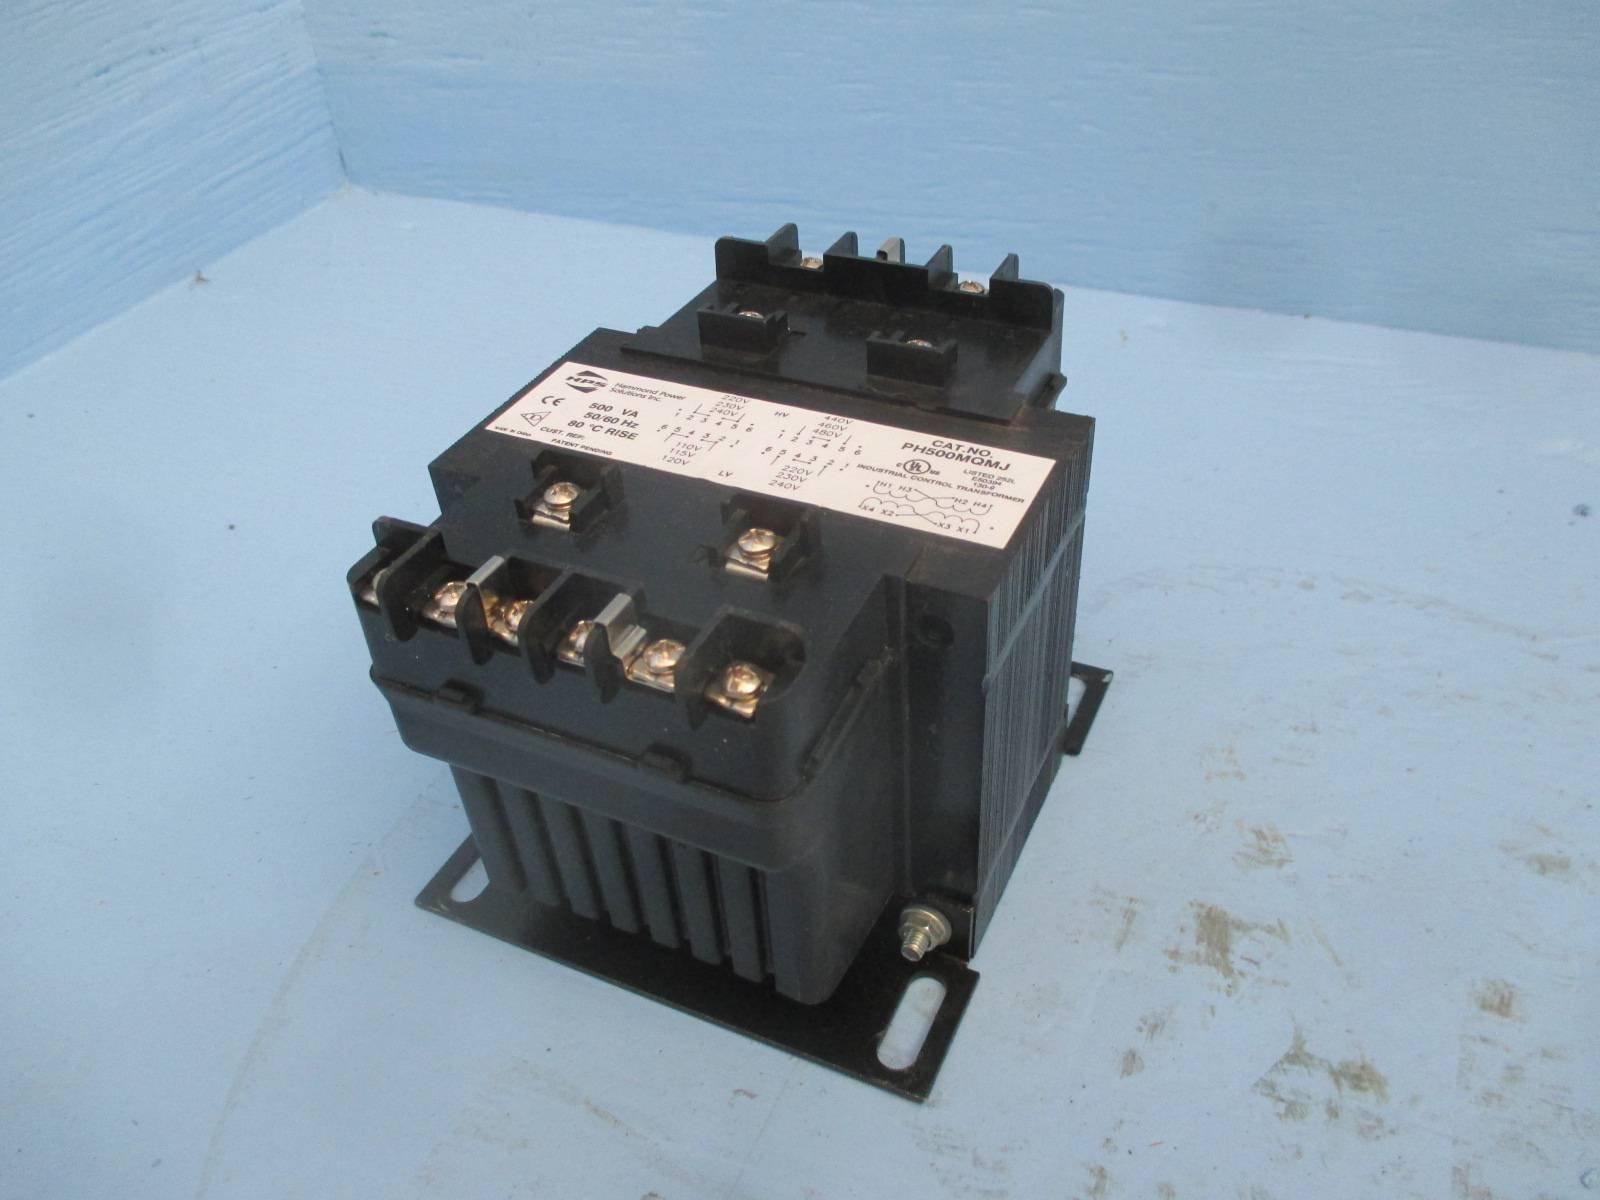 HPS PH500MQMJ 500 VA 240/480 - 120/240 Industrial Control Transformer .5 kVA 1PH